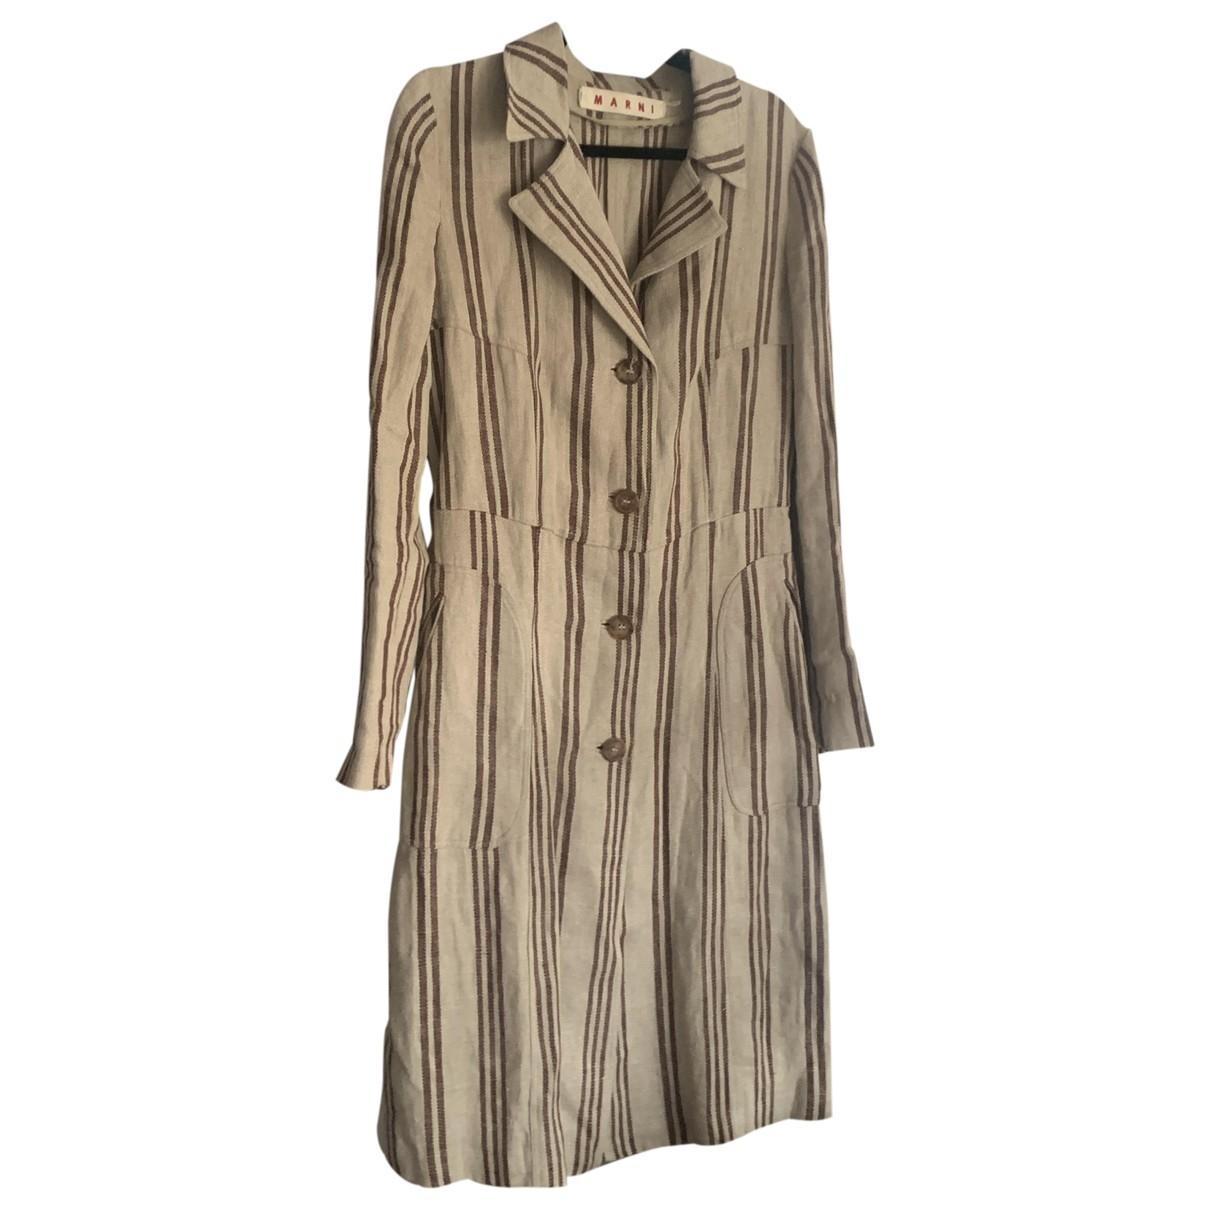 Marni \N Beige Linen coat for Women 44 FR